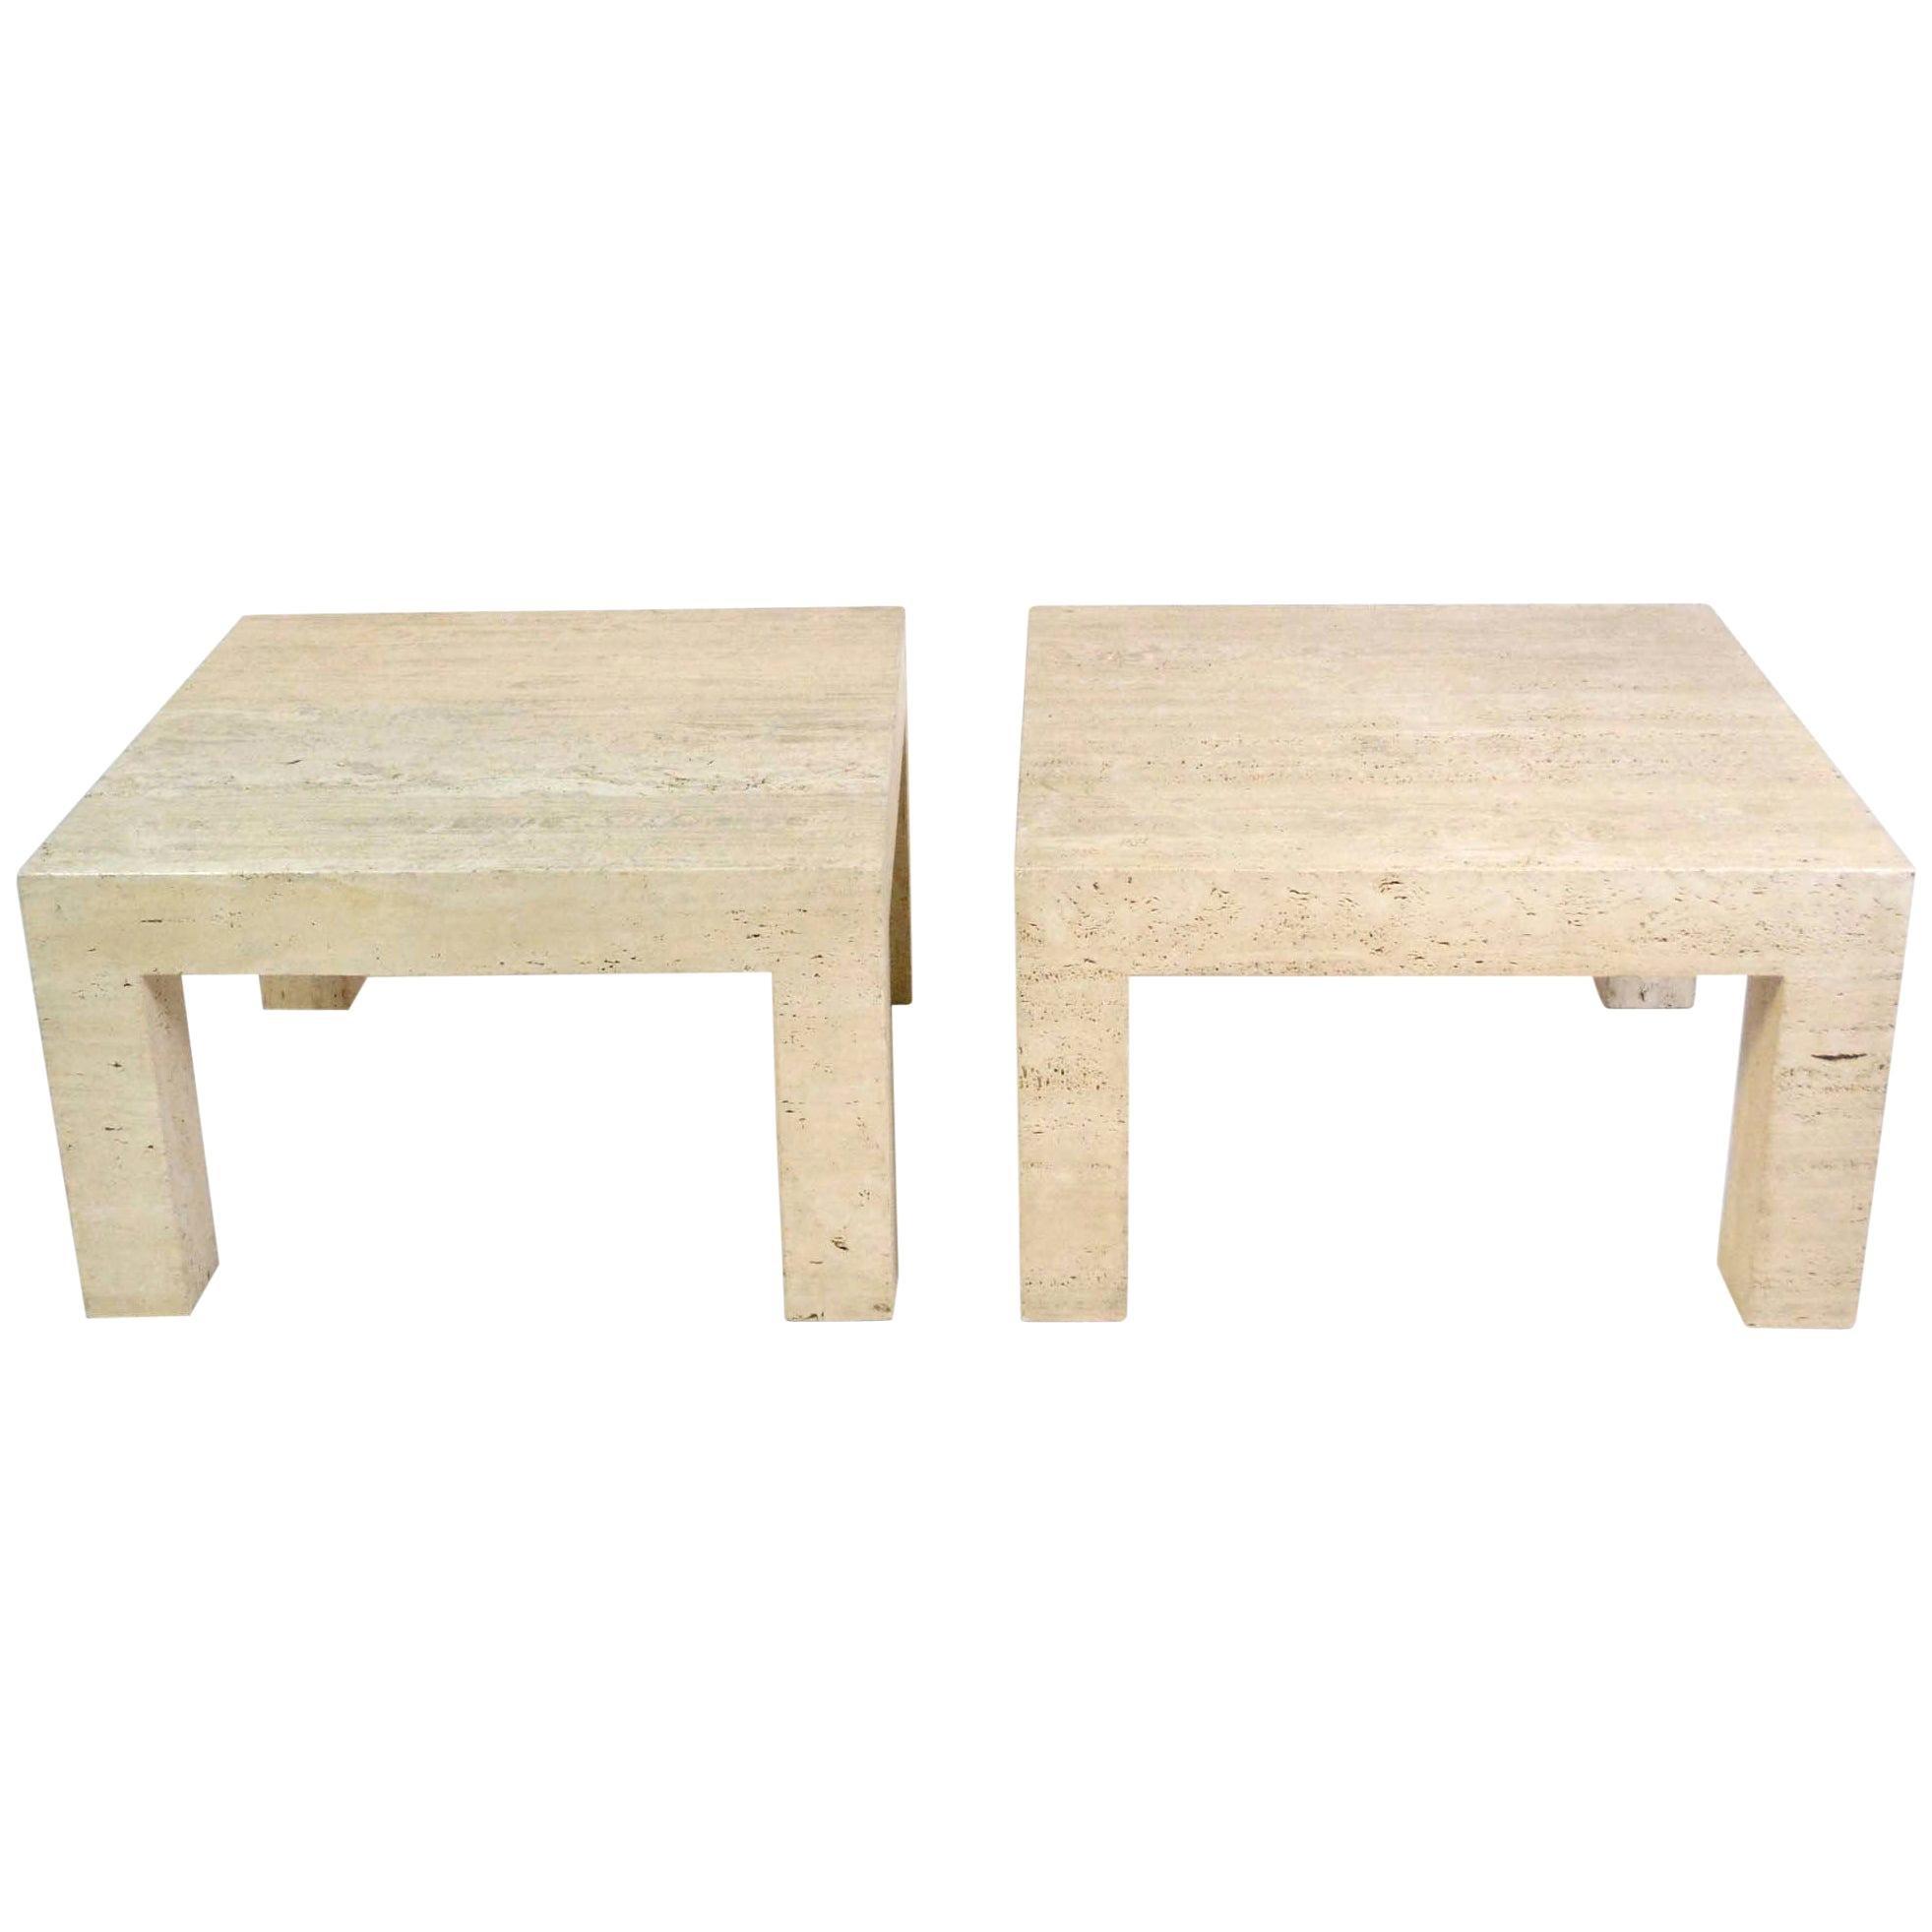 Pair of Vintage Travertine Parsons Tables